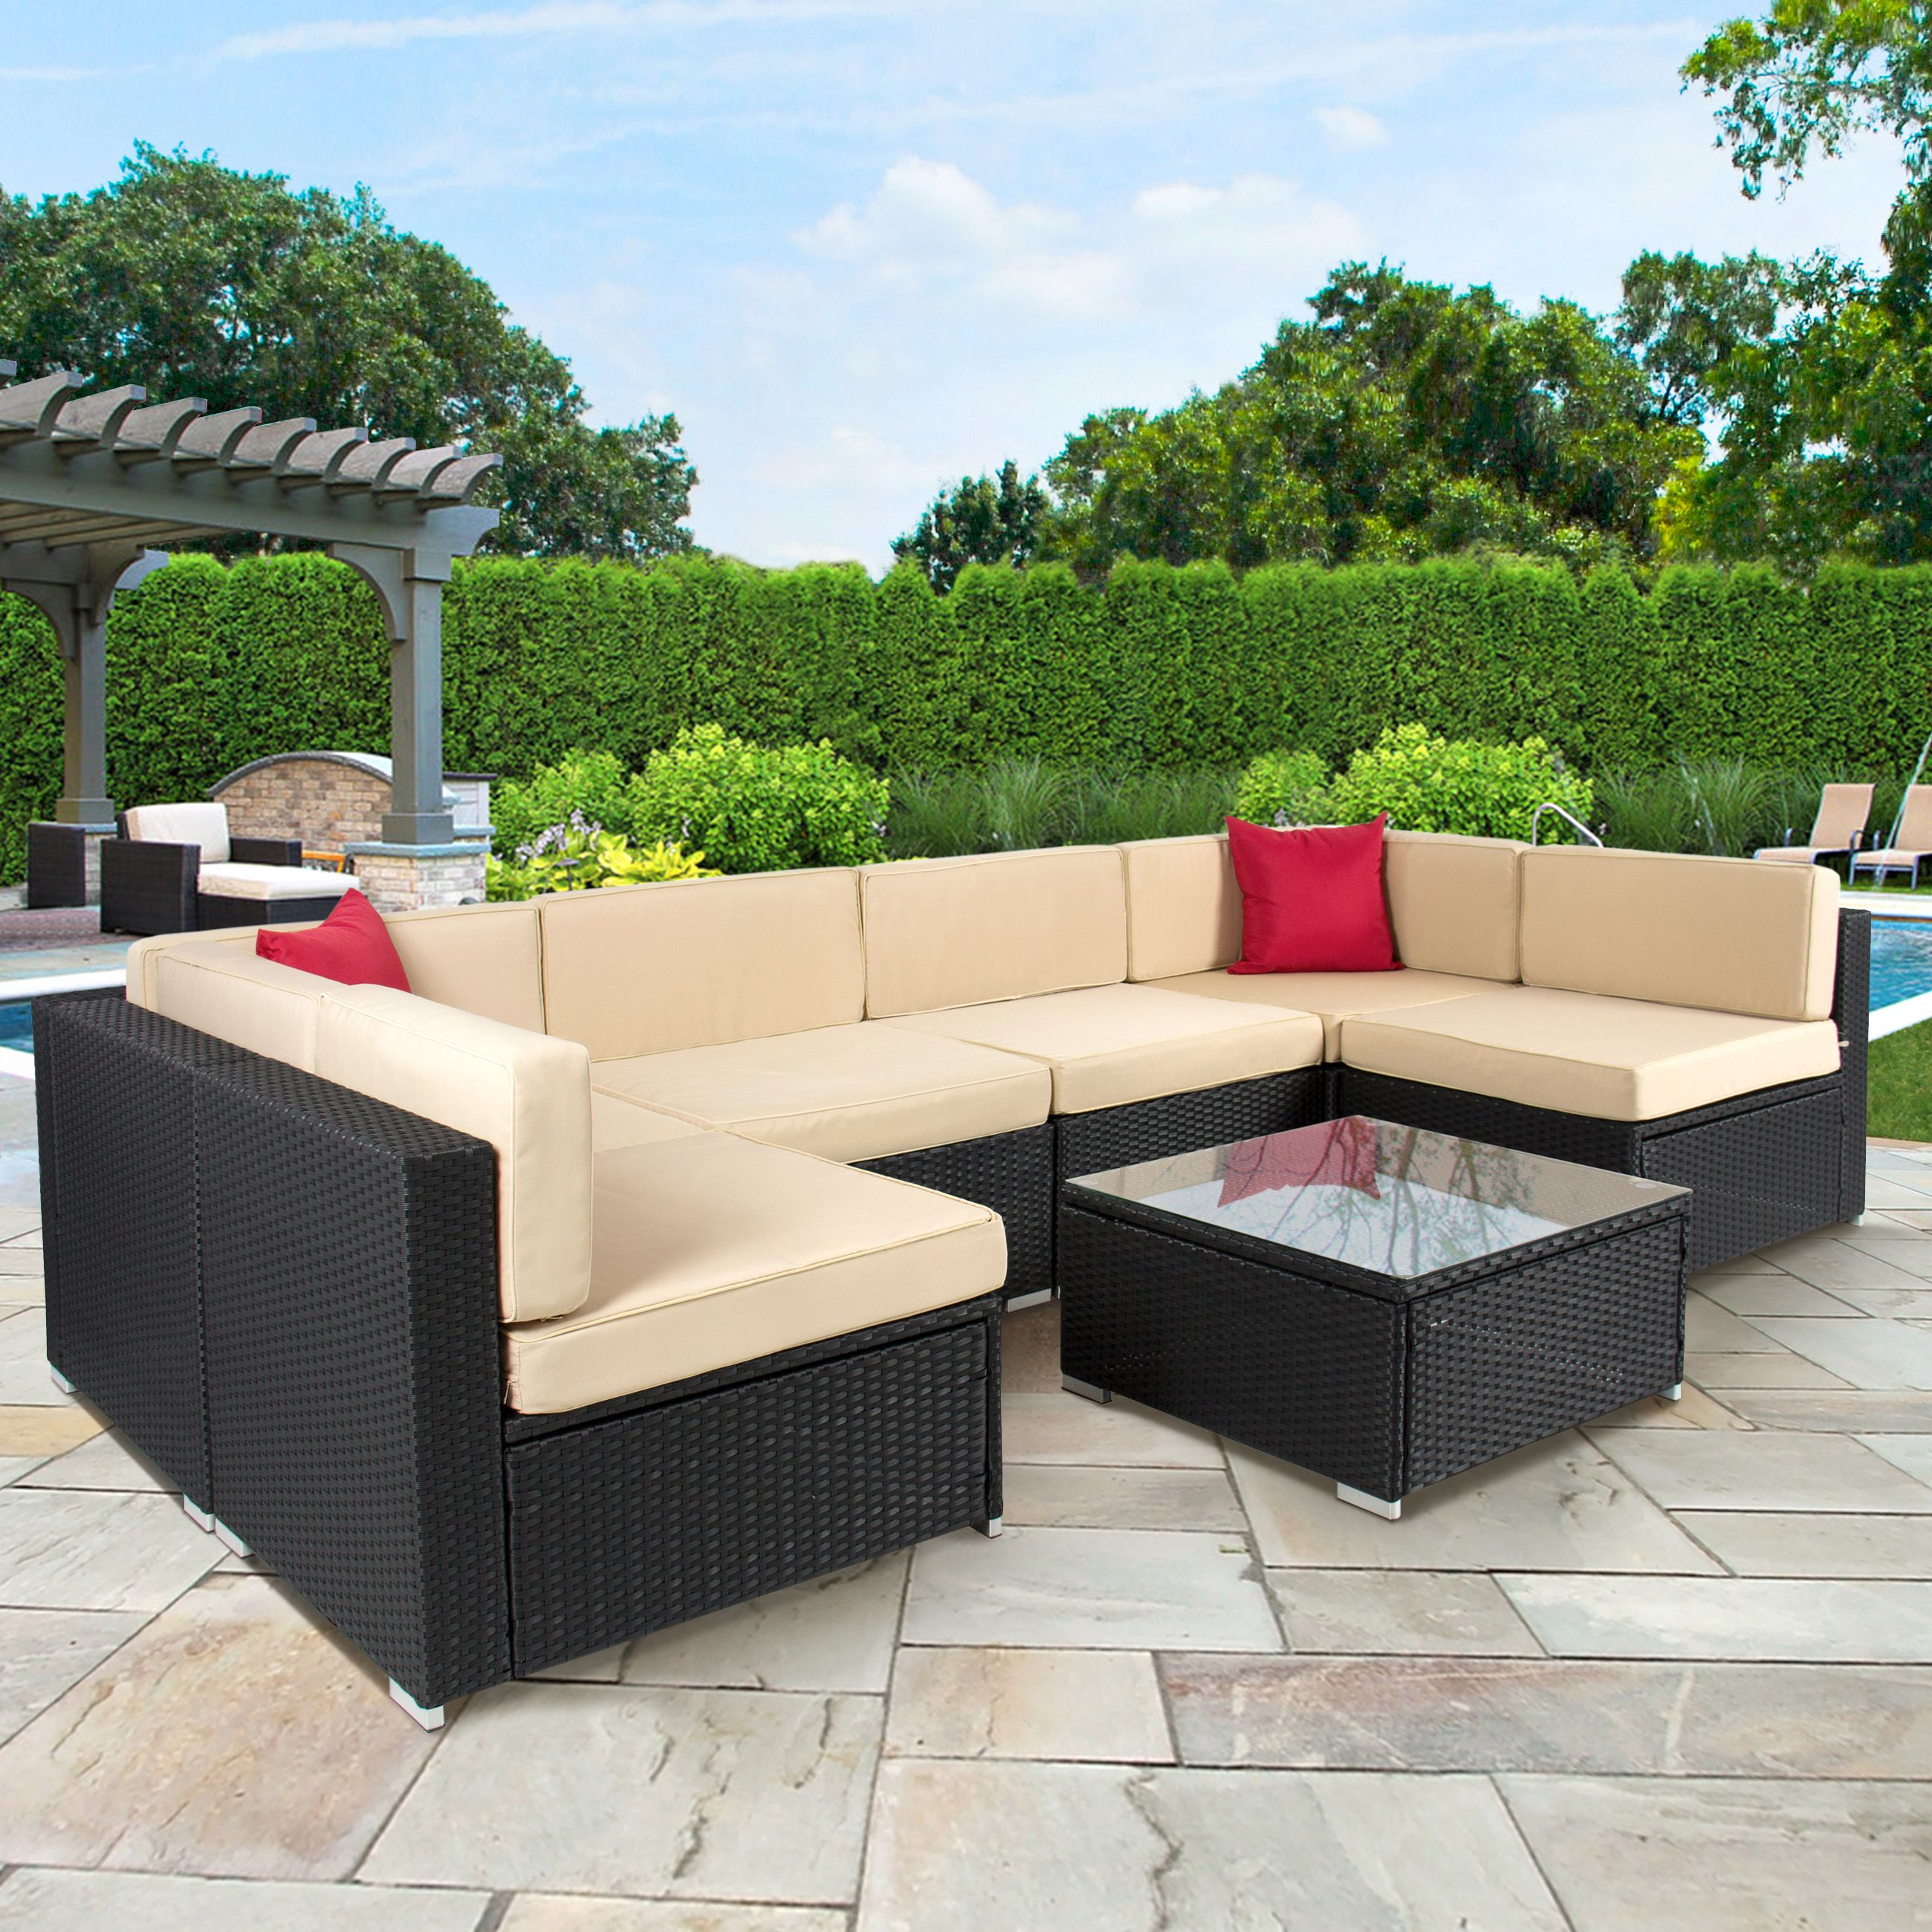 7pc outdoor patio garden wicker furniture rattan sofa set sectional